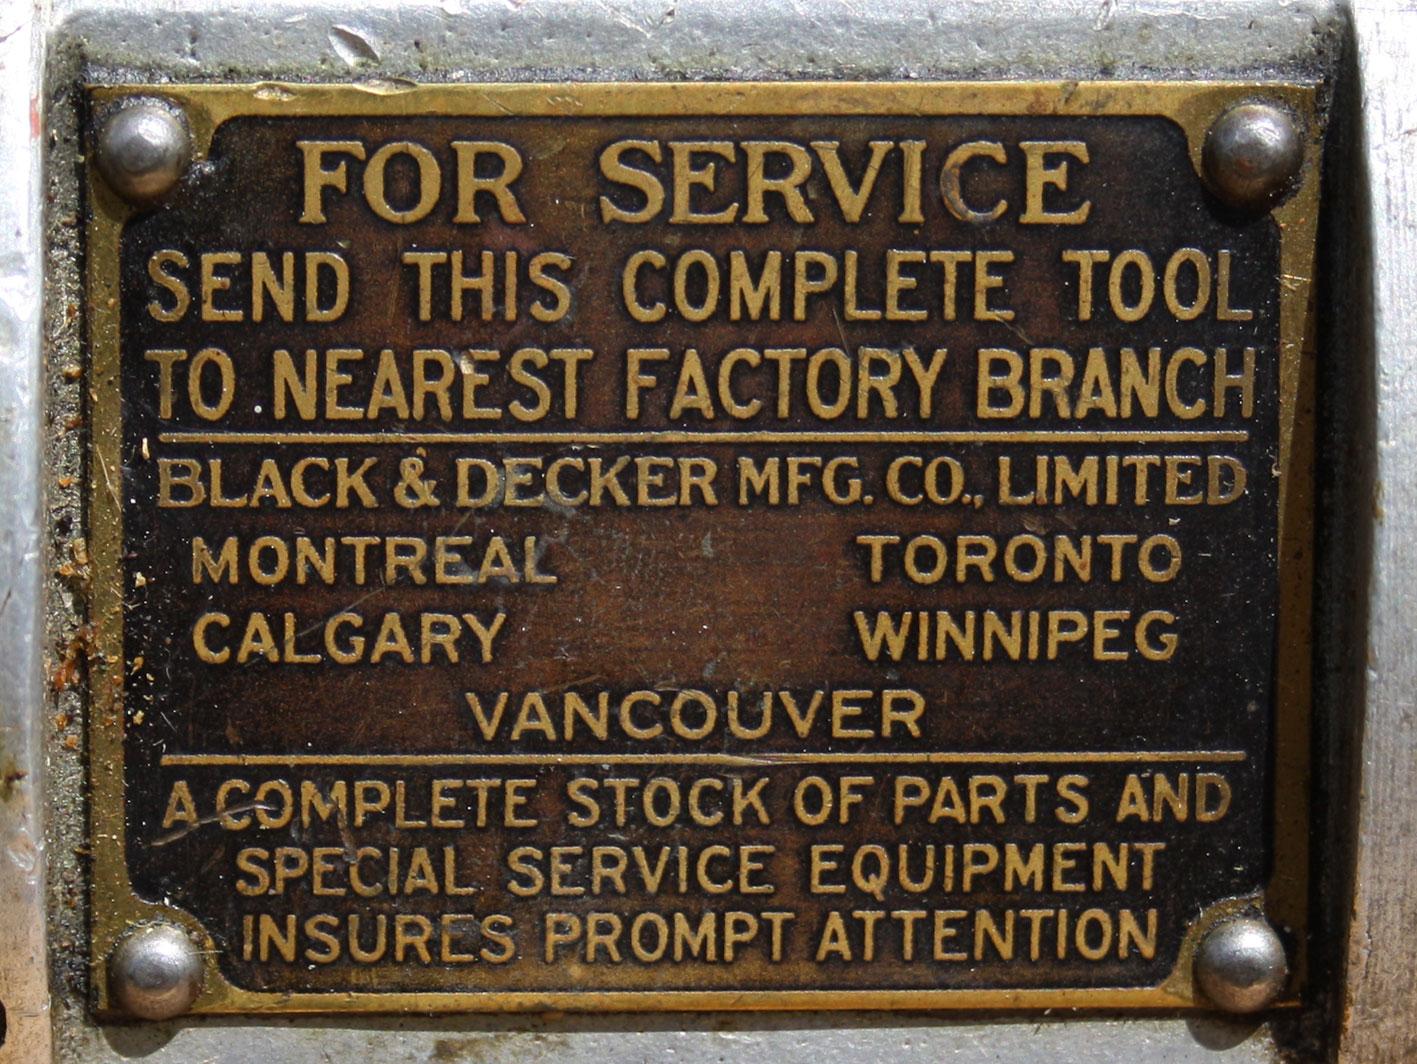 Decker Electric Company Inc